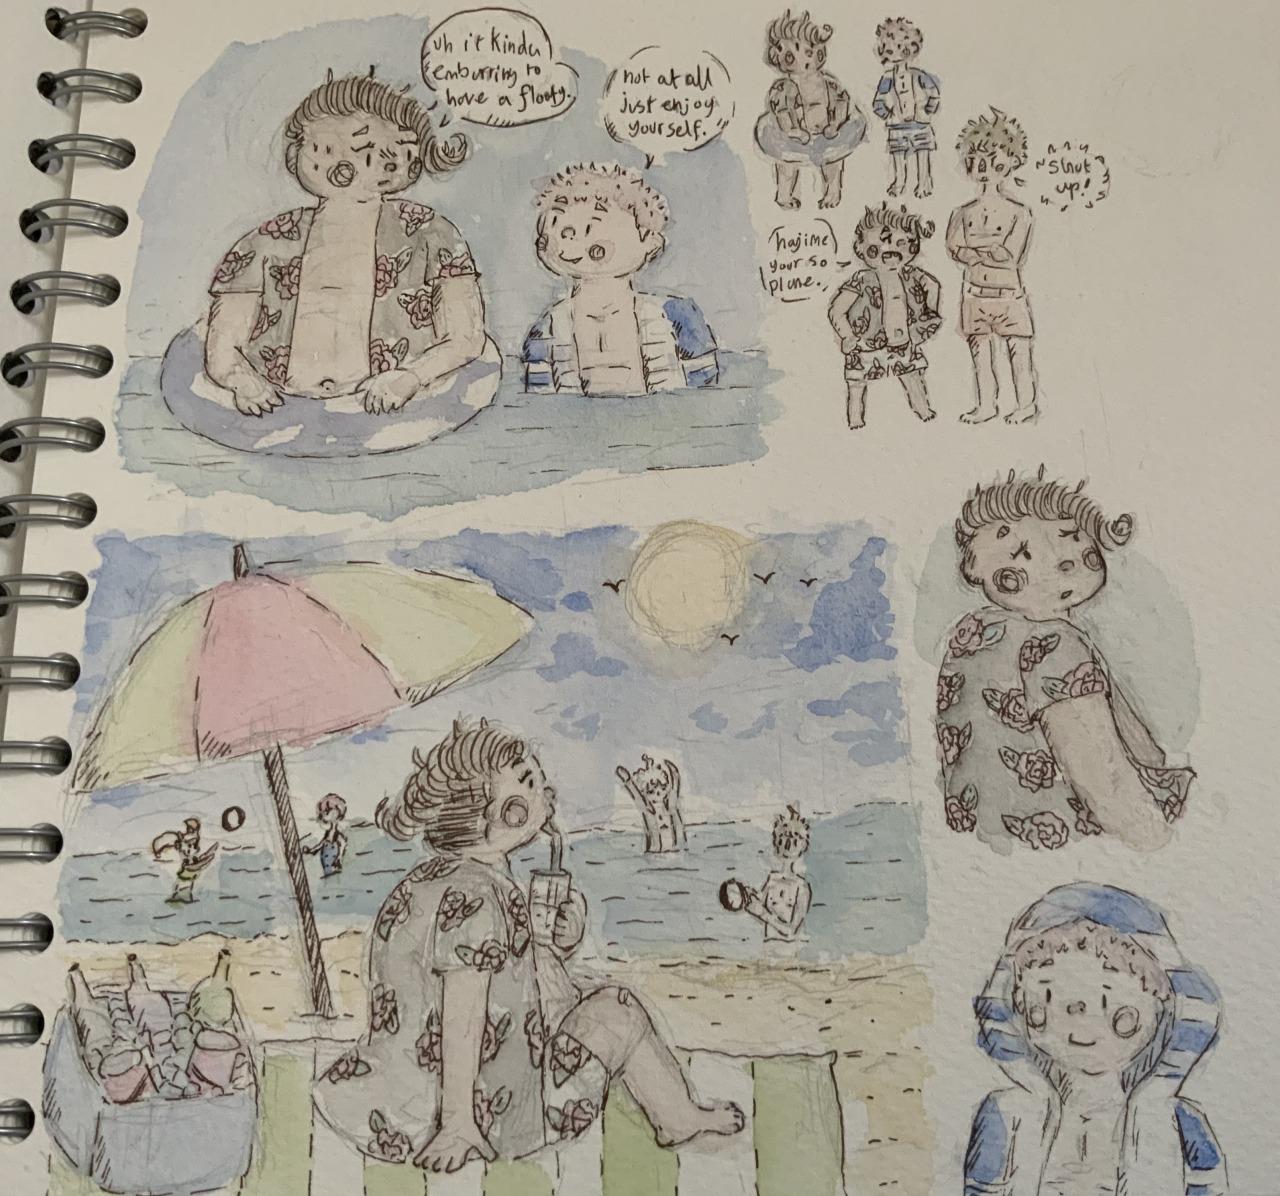 Here some drawings of teruteru, ryoma and hajime in there swim wear enjoying the beach. #teruteru hanamura#teruteru#ryoma hoshi#Hajime Hinata#danganronpa